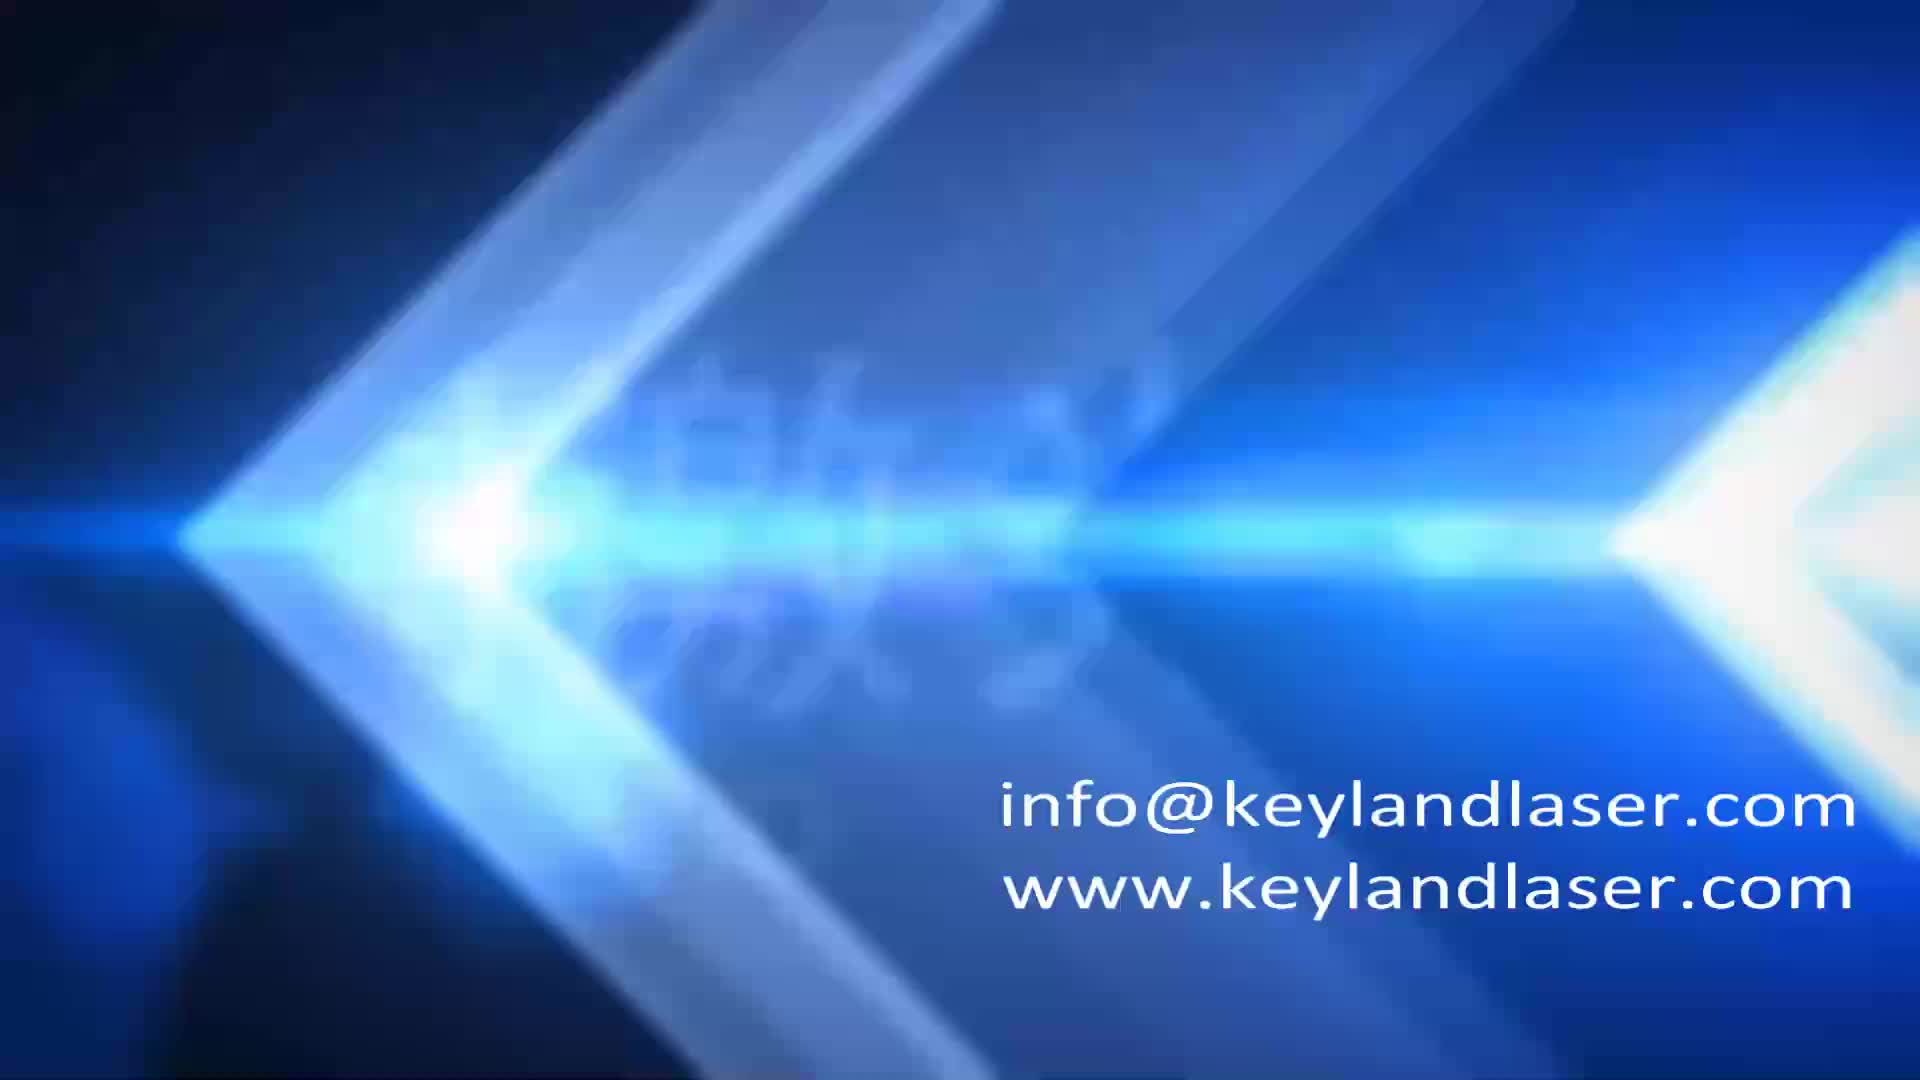 3040 4060 1060 1390 1612 1325 Servomotor CNC Co2 lasersnijmachine met 60 w 80 W 100 W 150 W 200 W maquina de corte een laser